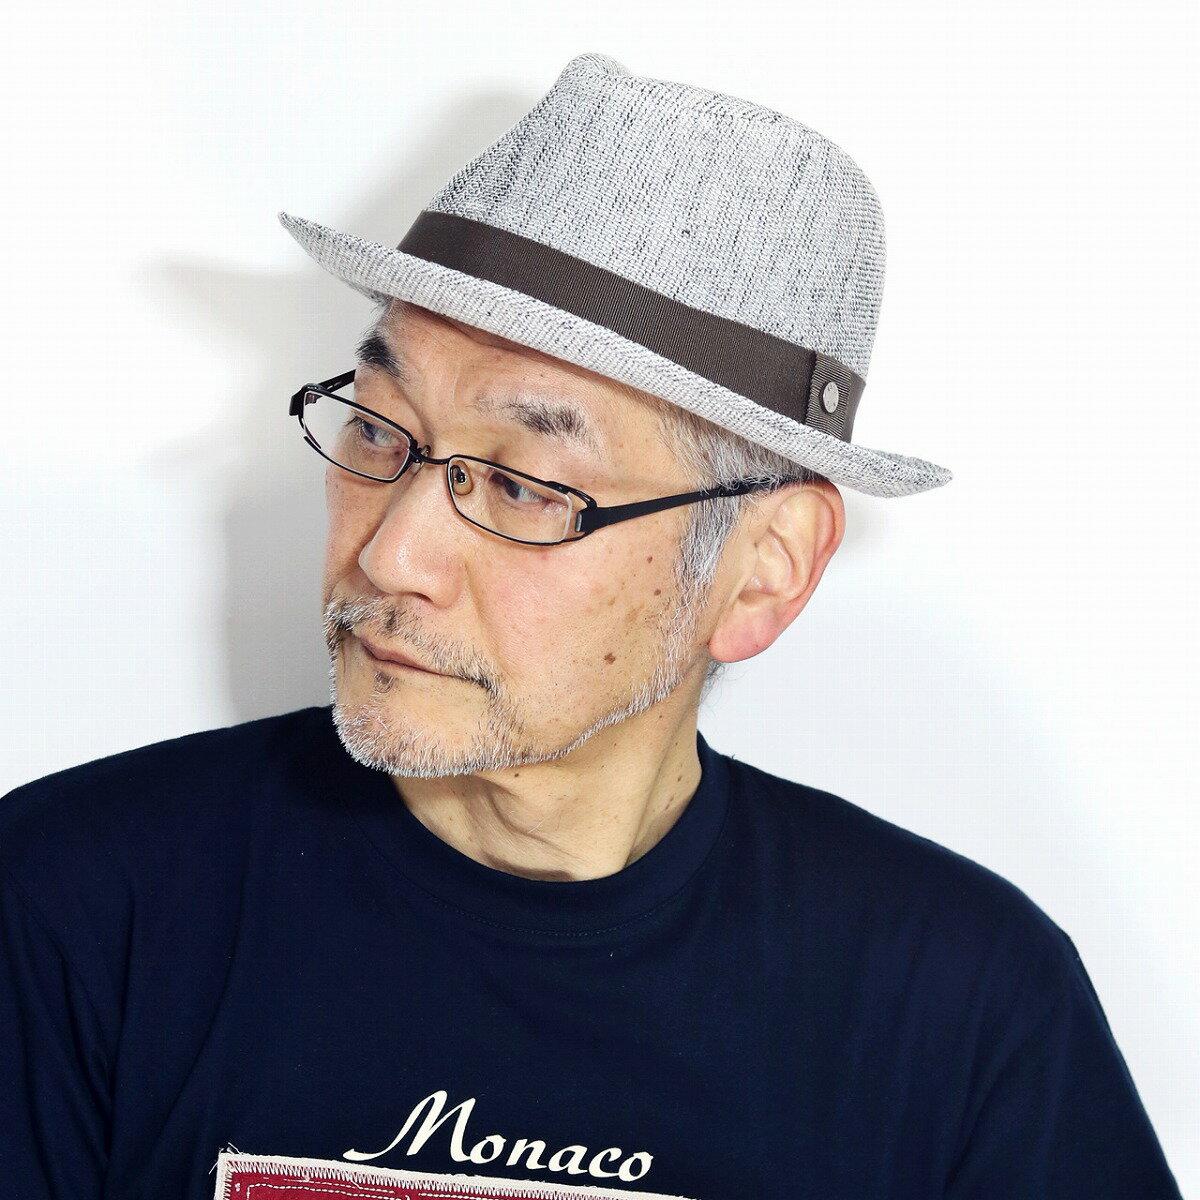 DAKS ハット メンズ カラミリネン セントポール ダックス ハット 中折れ 春 夏 麻100% 日本製 57cm 59cm 61cm daks 帽子 サイズ調整 紳士 ファッション グレー[ fedora ]男性 誕生日 帽子 父の日 ギフト プレゼント